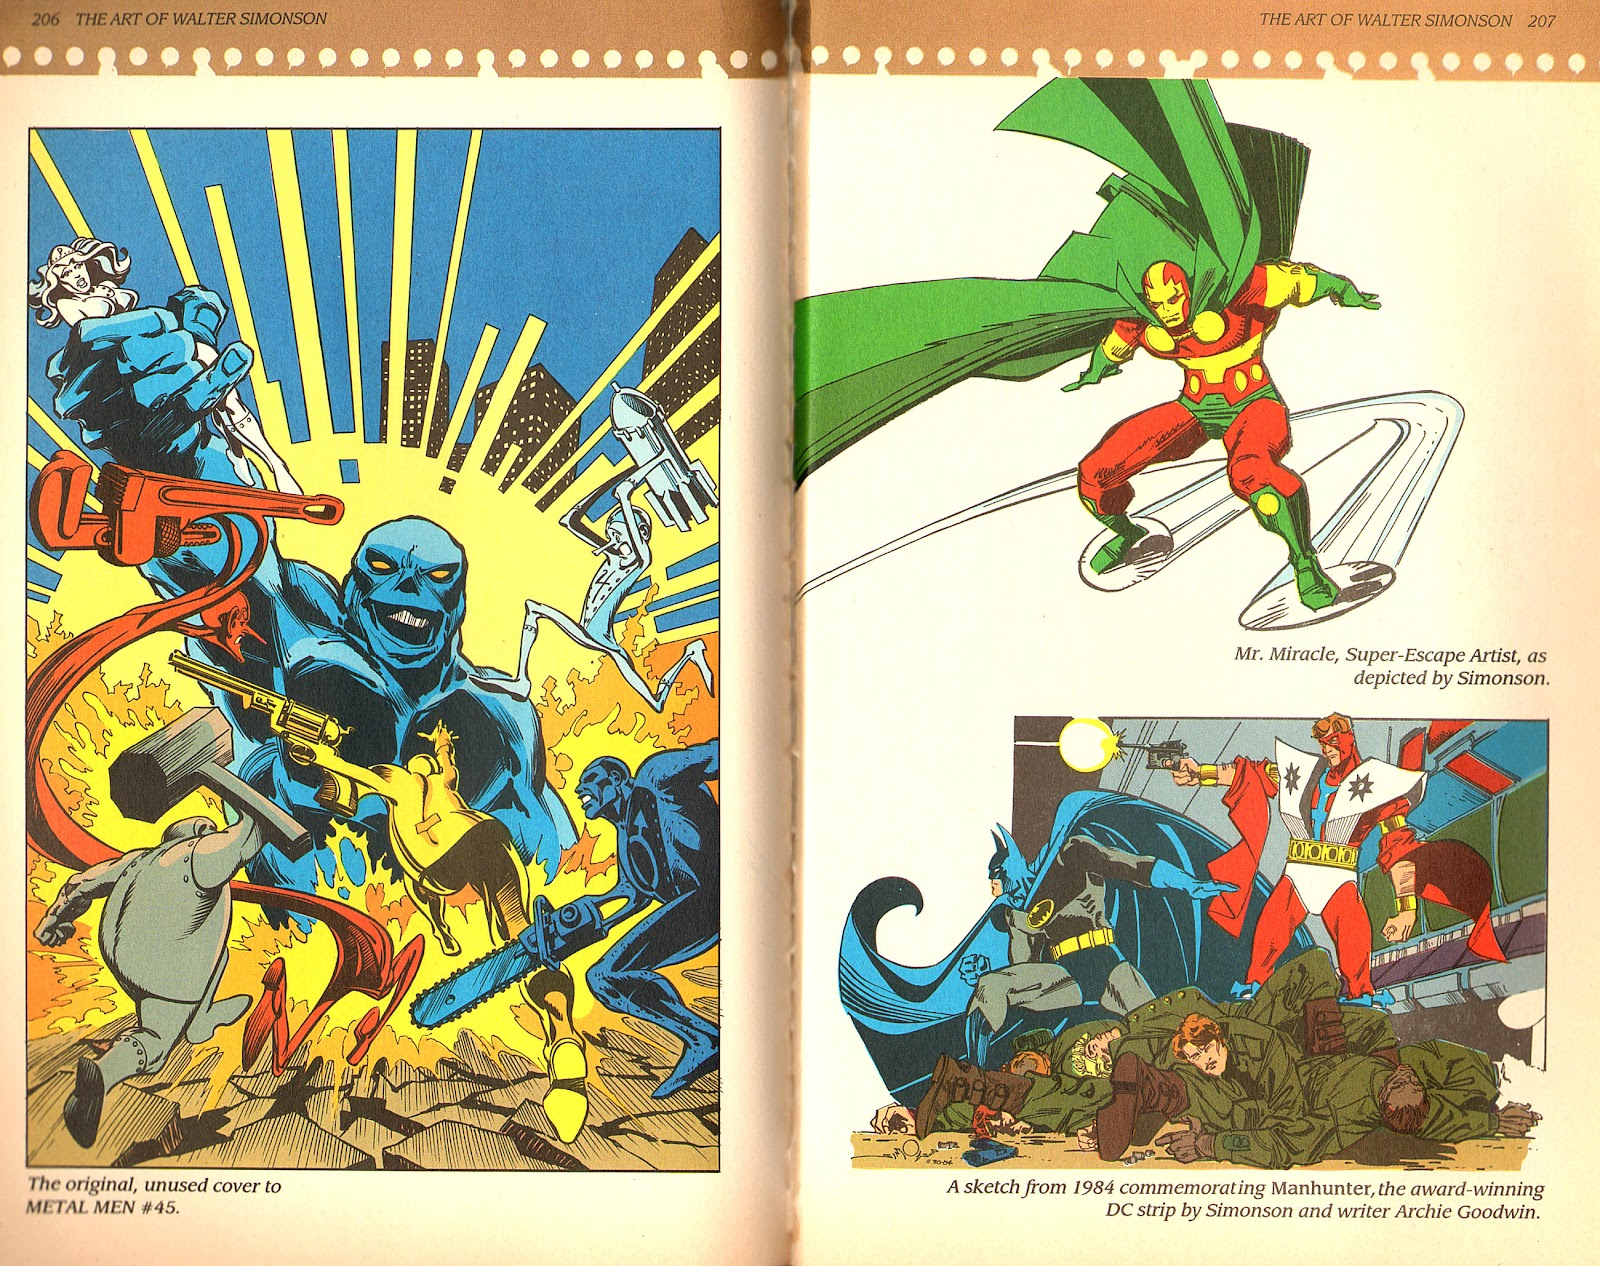 Read online The Art of Walter Simonson comic -  Issue # TPB - 105